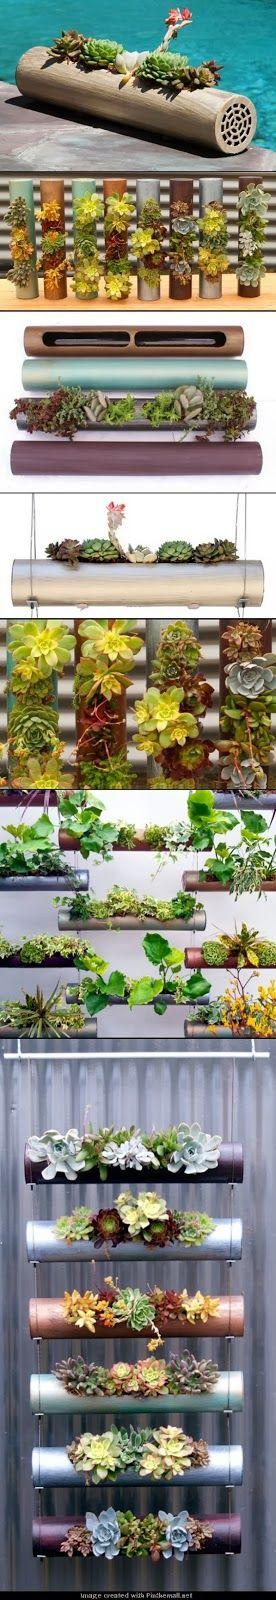 DIY AND CRAFT MIRACLES : Cool DIY Indoor-Outdoor Modular Cylinder Planters